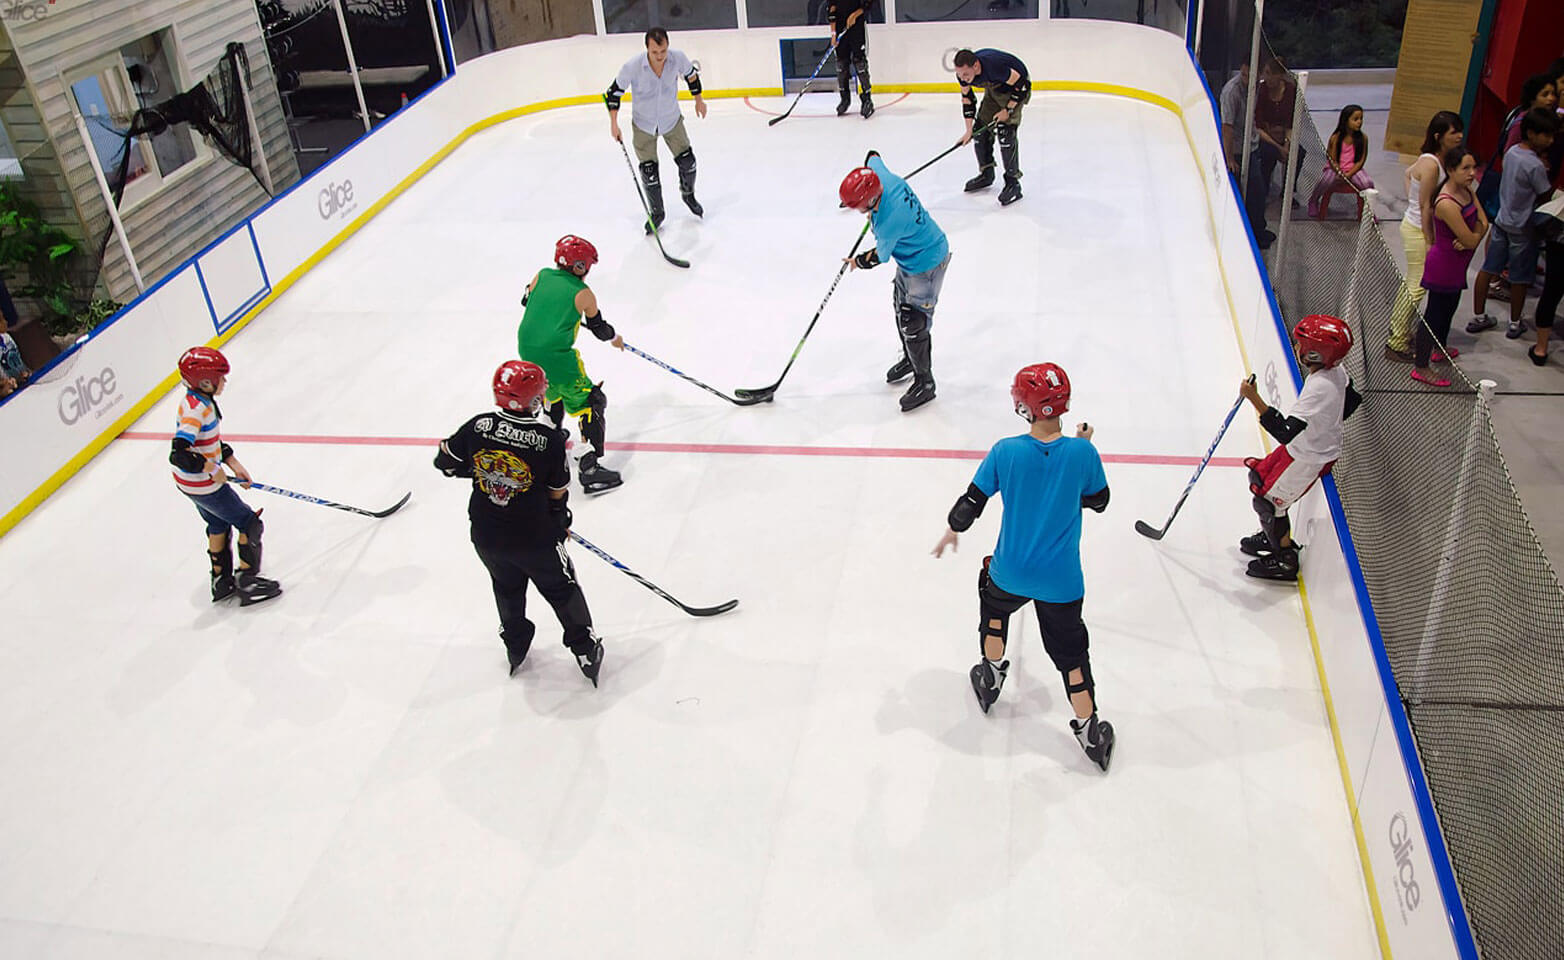 Bird's eye view onto synthetic ice rink mini arena